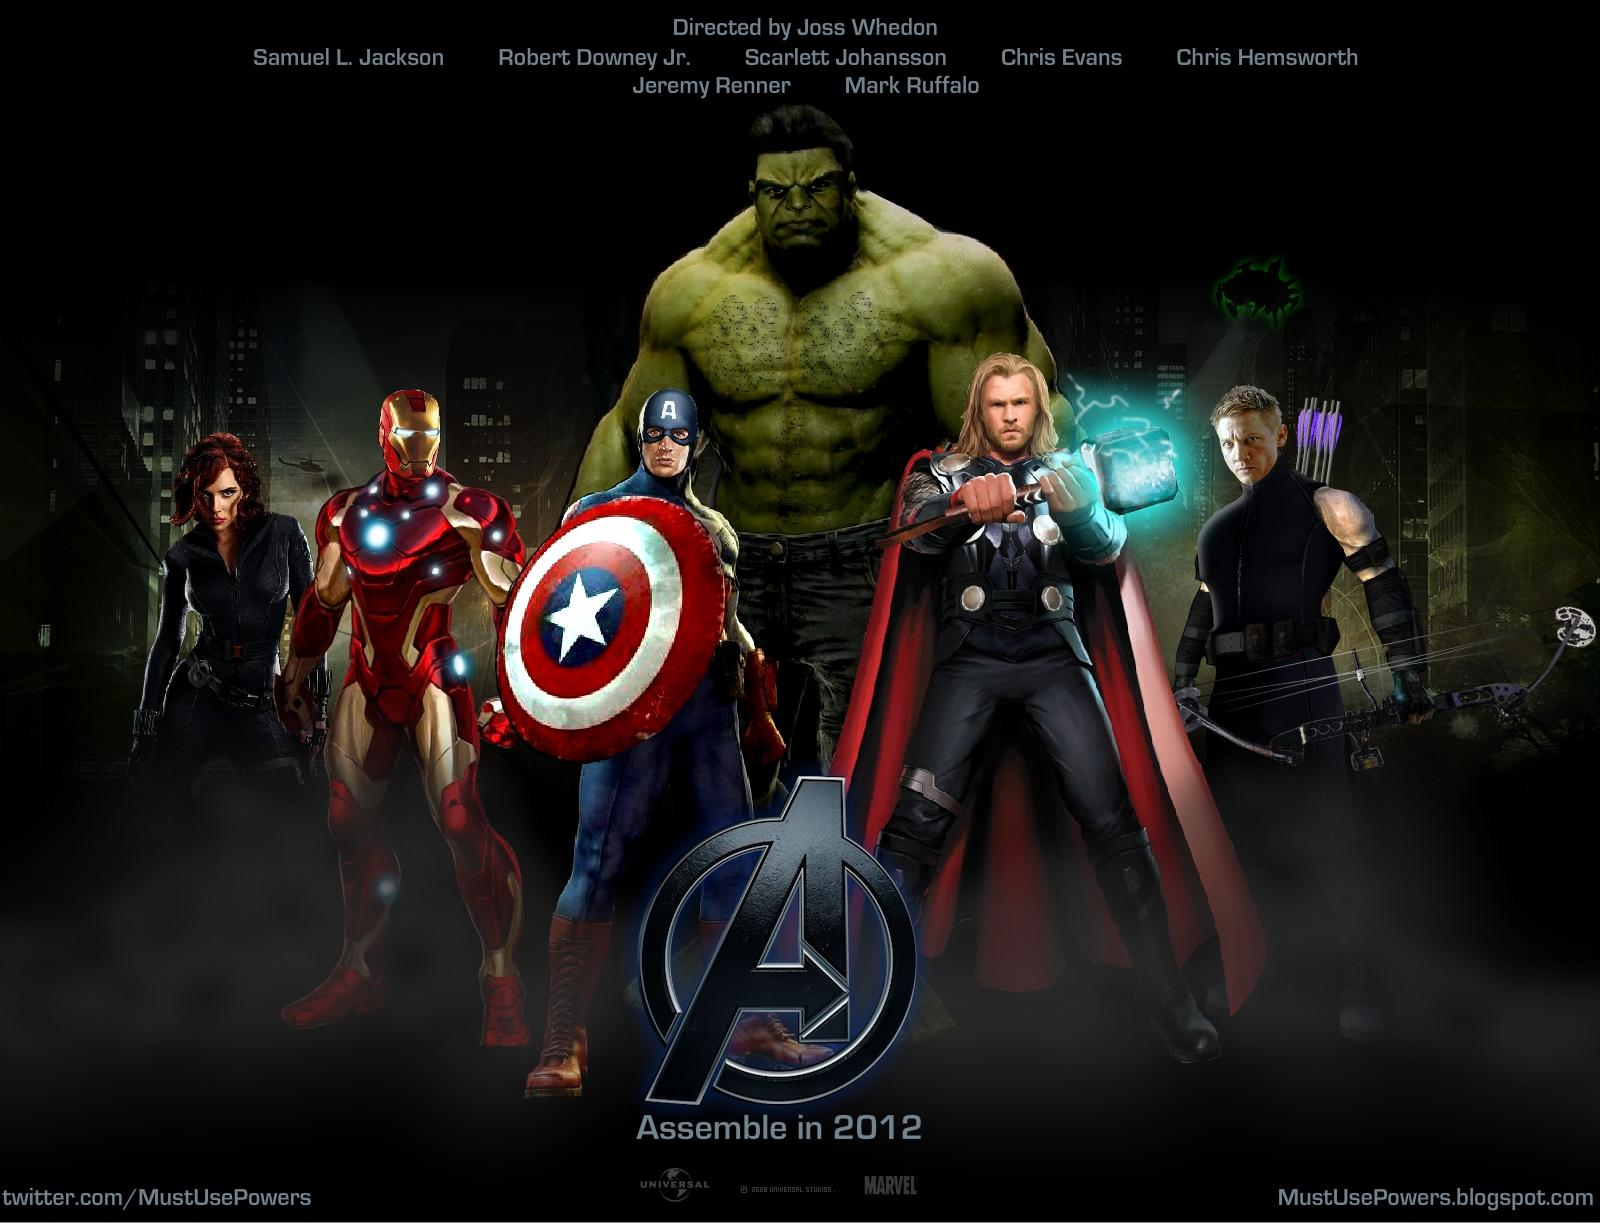 Fantastic   Wallpaper Home Screen Marvel - avengers-movie-2012-hd-wallpaper  Pic_624191.jpg